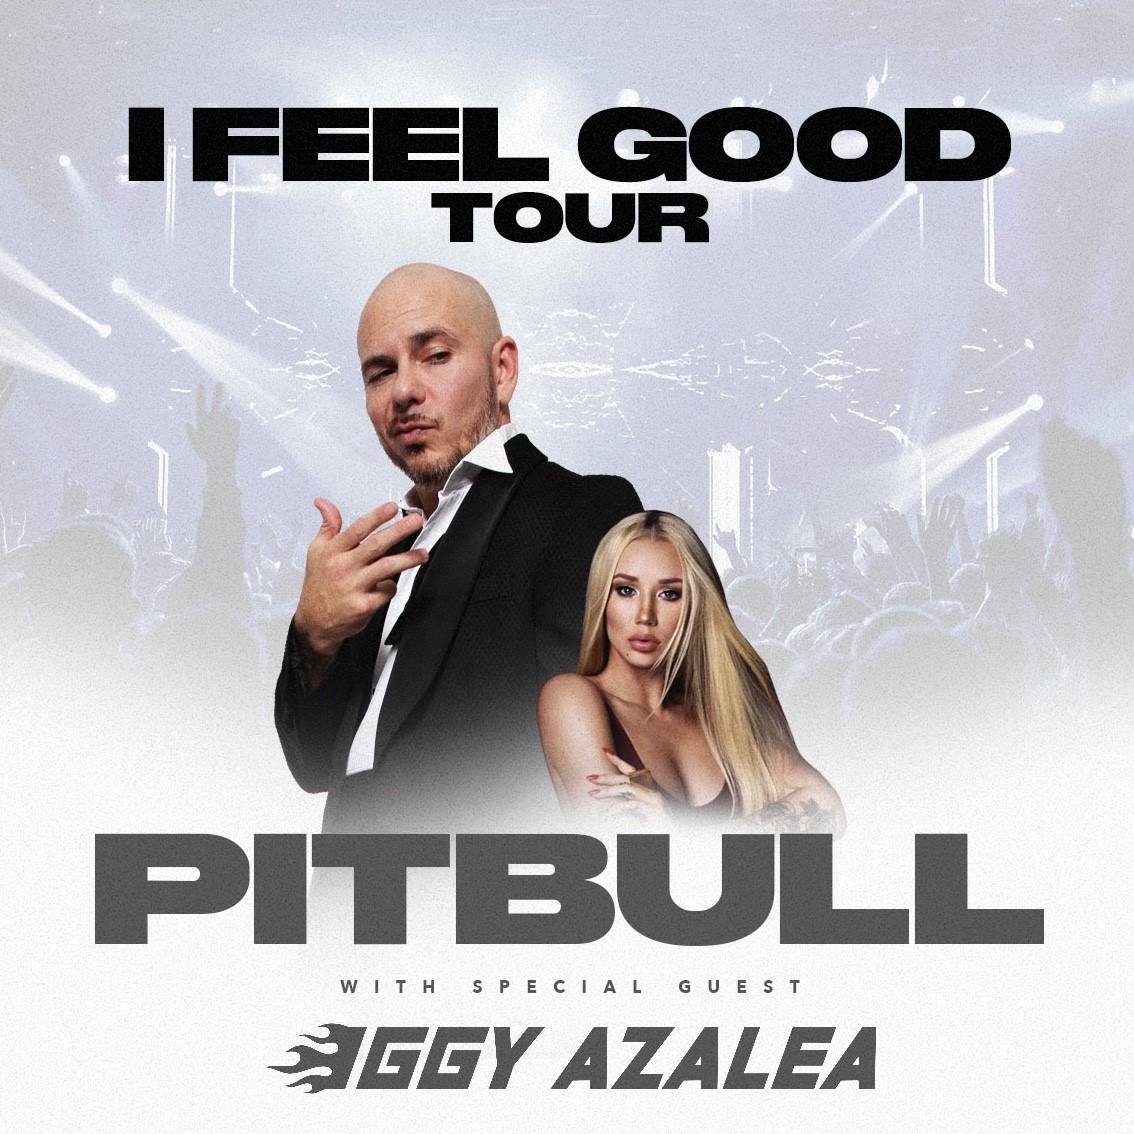 OCT 10 – Pitbull